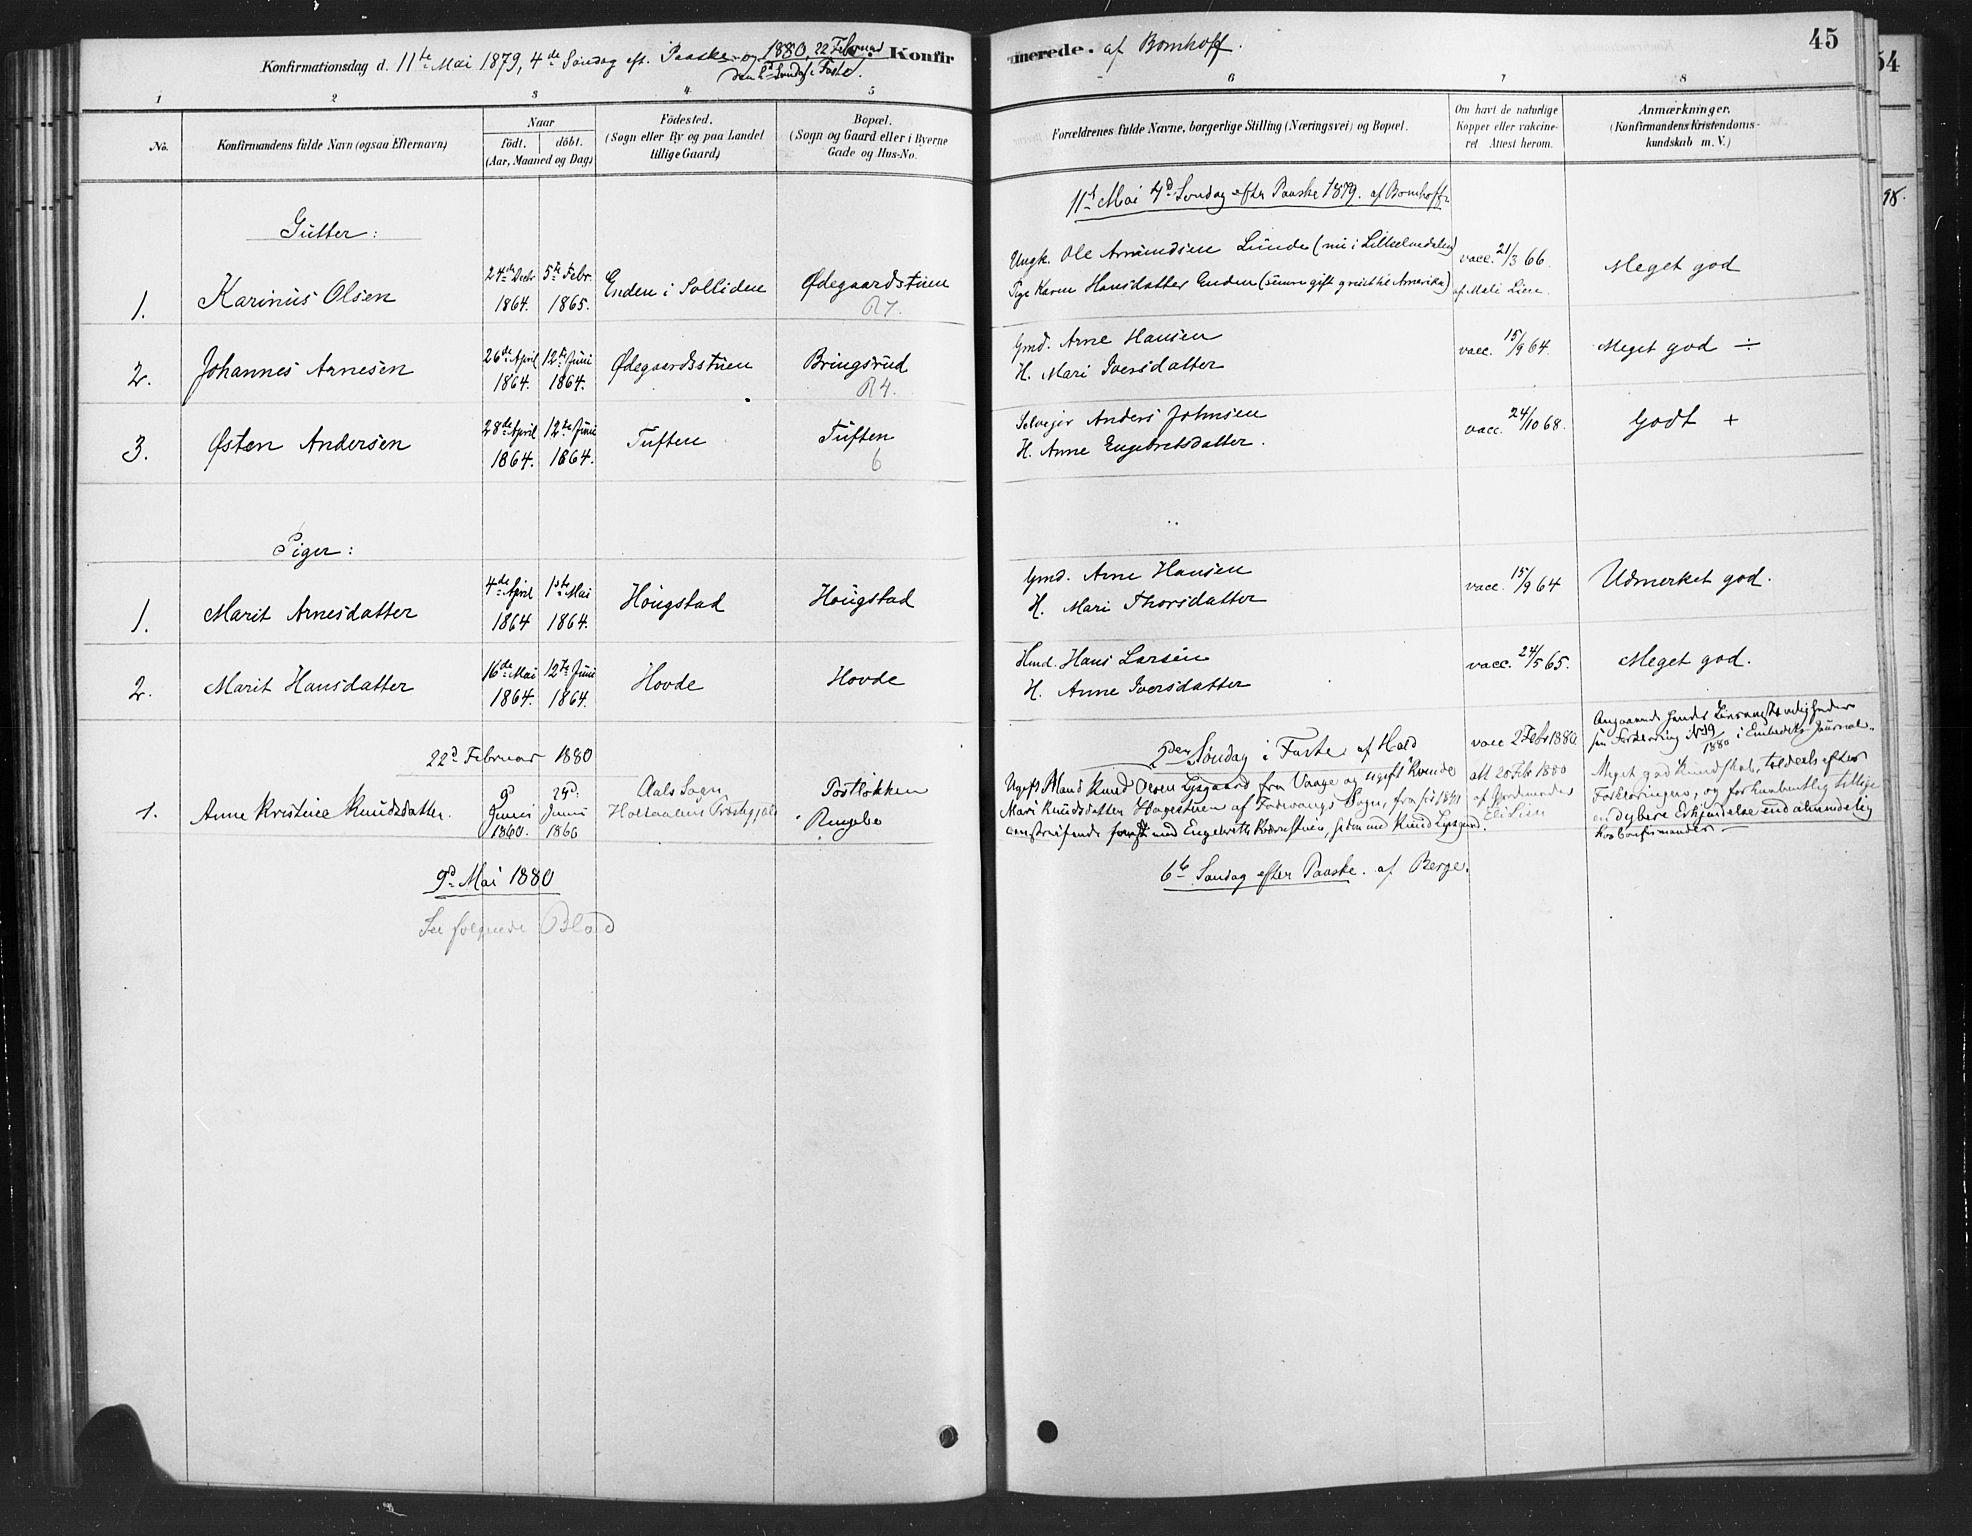 SAH, Ringebu prestekontor, Ministerialbok nr. 10, 1878-1898, s. 45